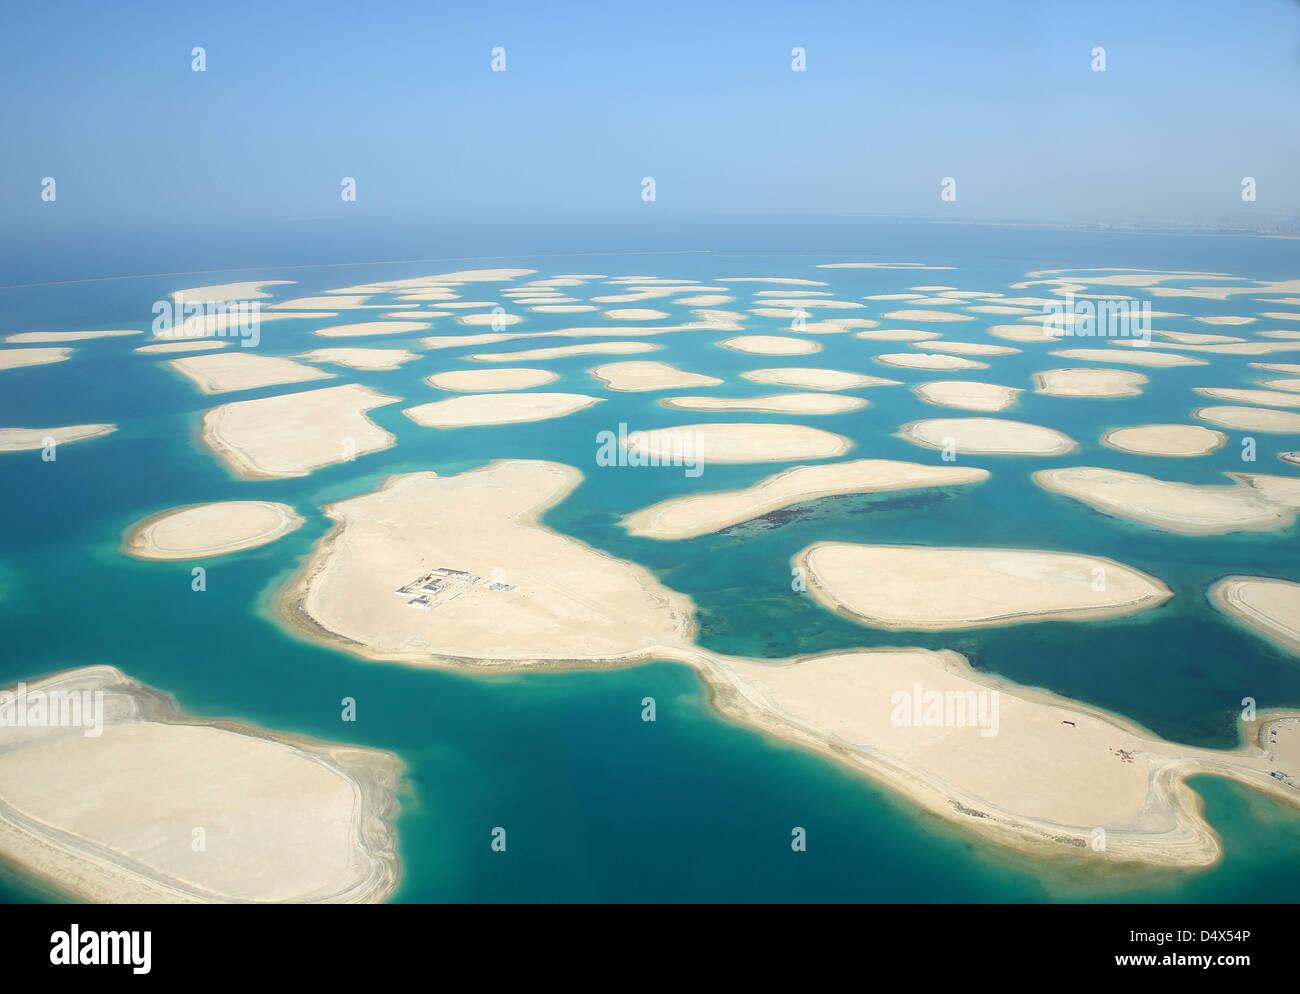 Aerial view of the world islands, Dubai, United Arab Emirates - Stock Image